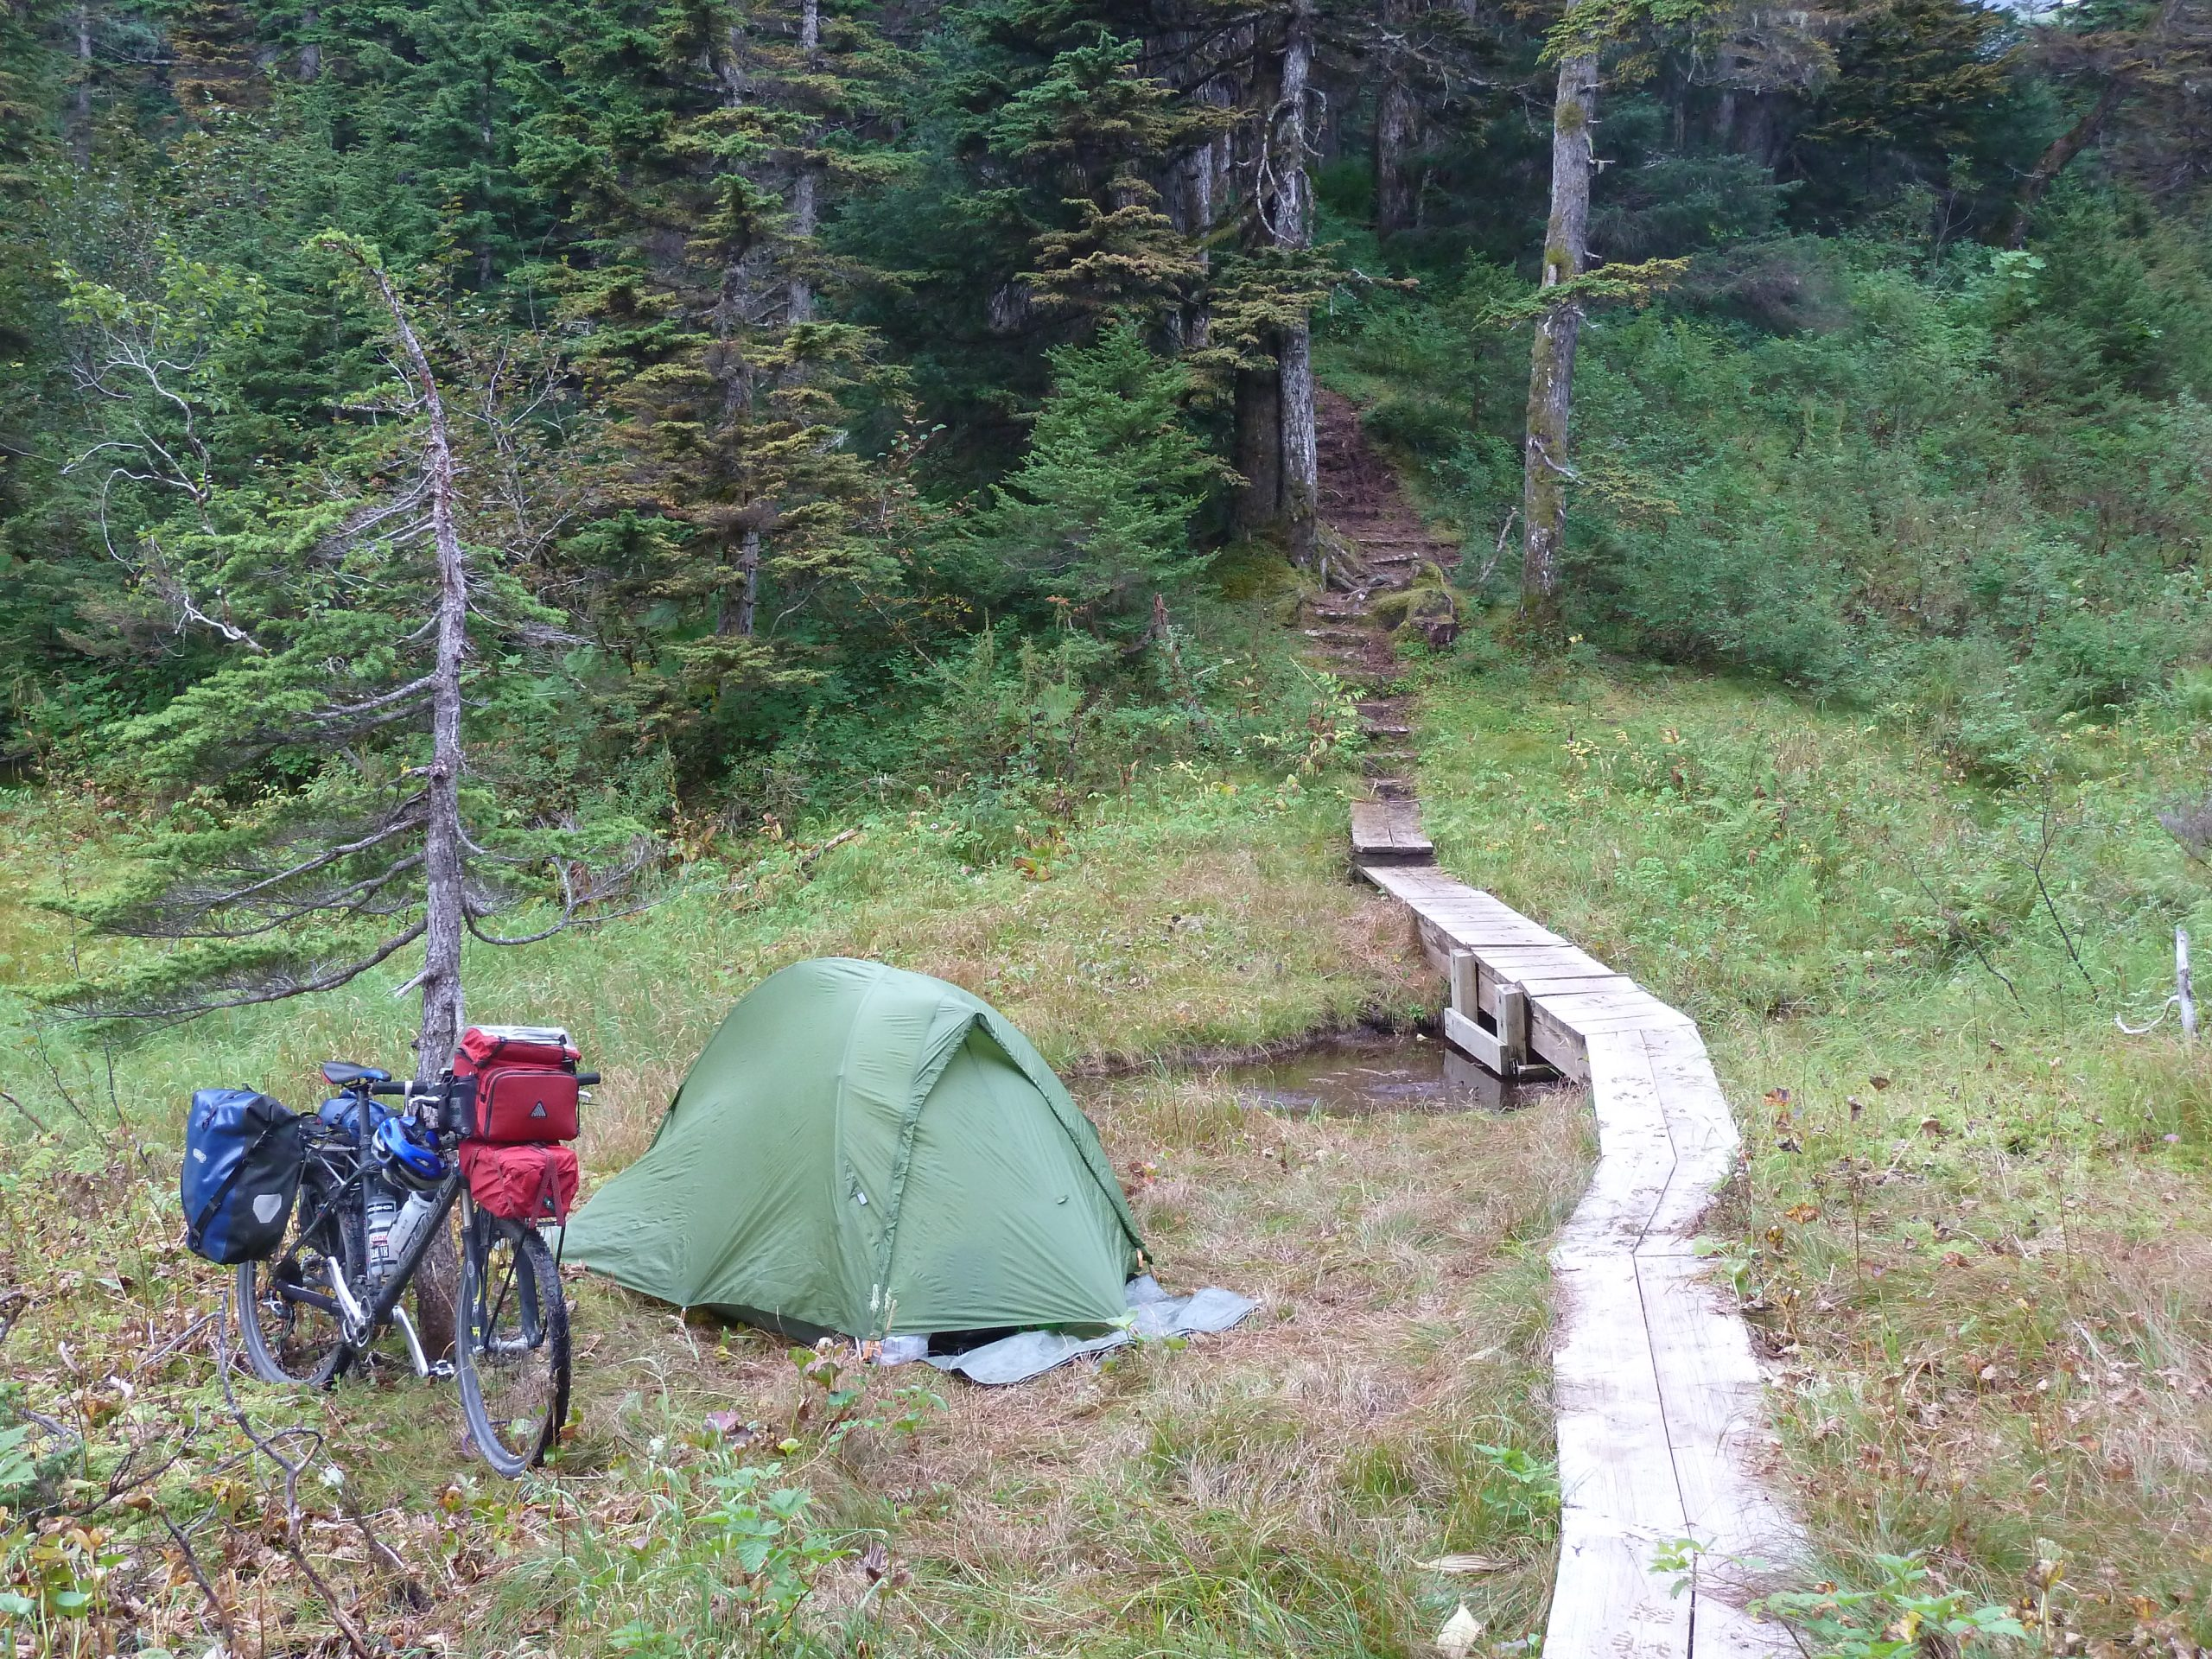 Radreise Alaska 2010 - Zeltplatz am Horsetail Falls Hiking Trail